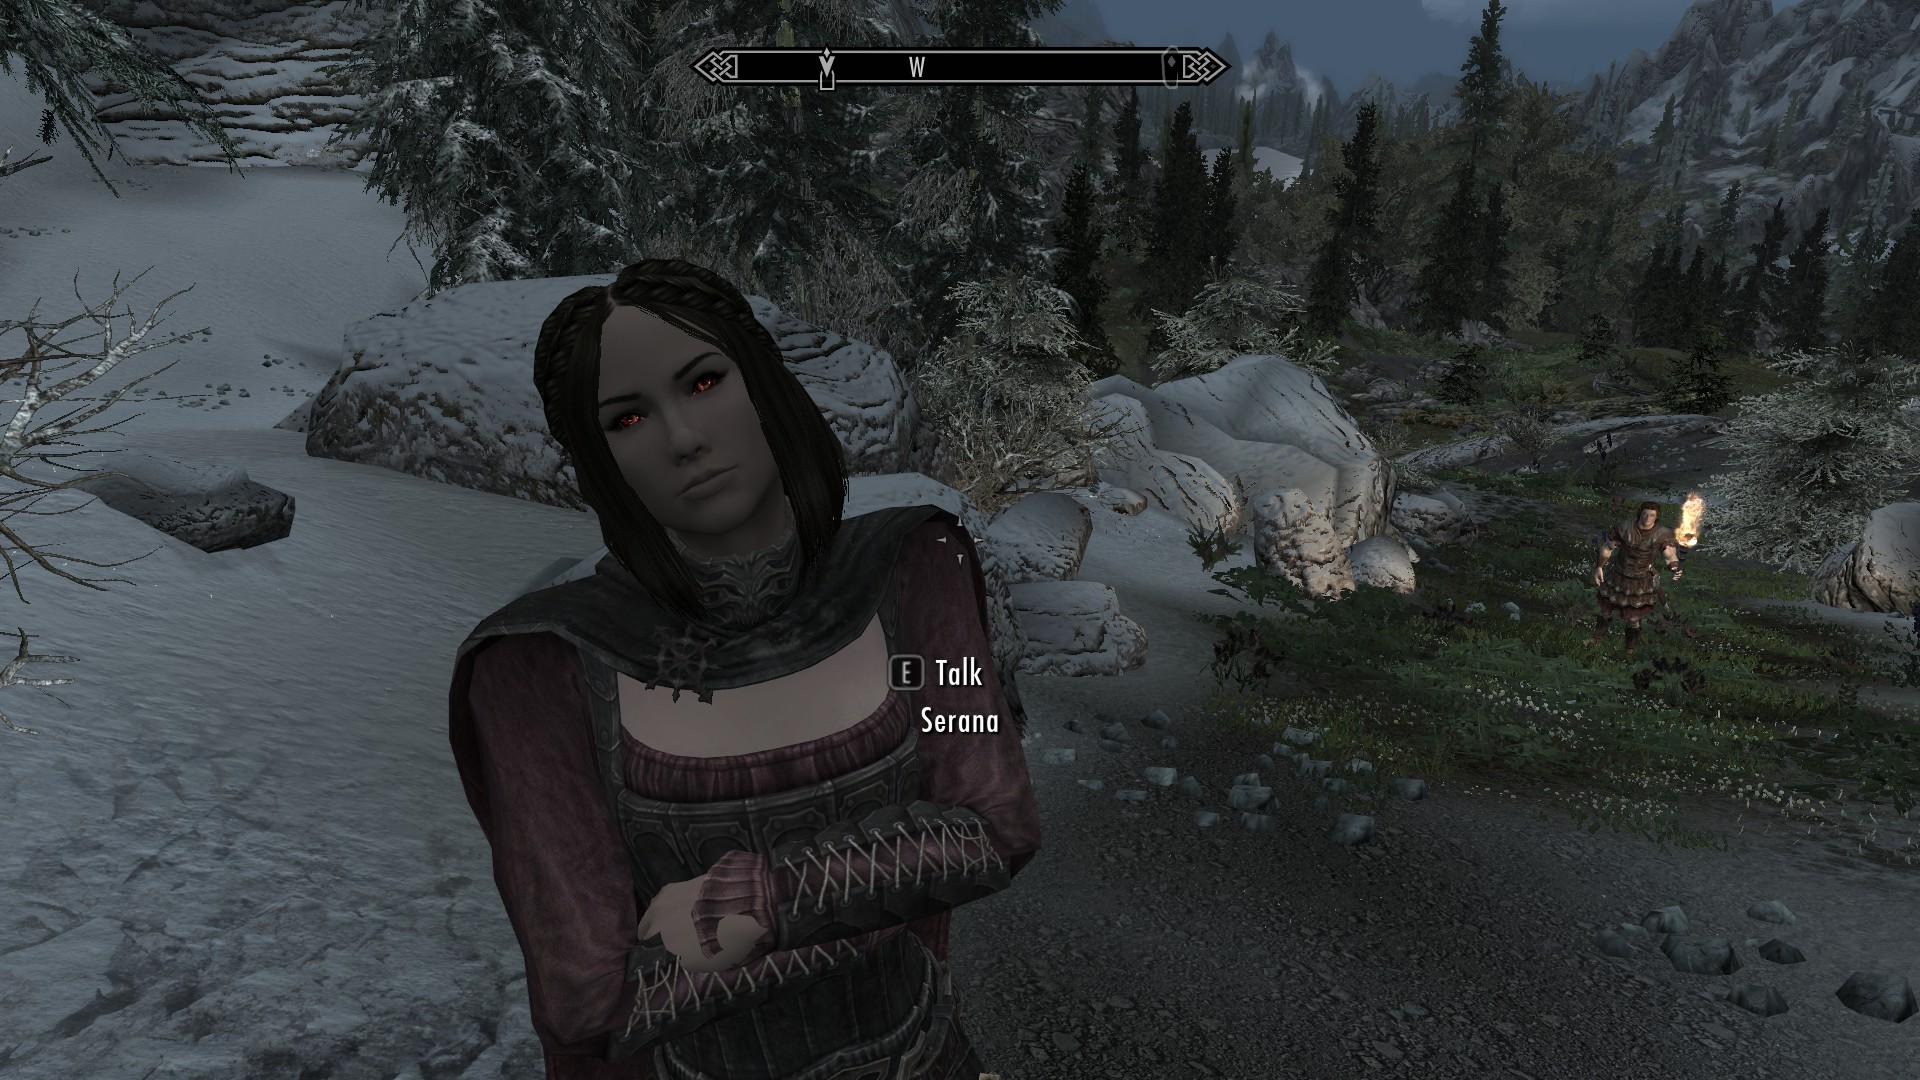 Skyrim females all have darker heads than their bodies : skyrimmods